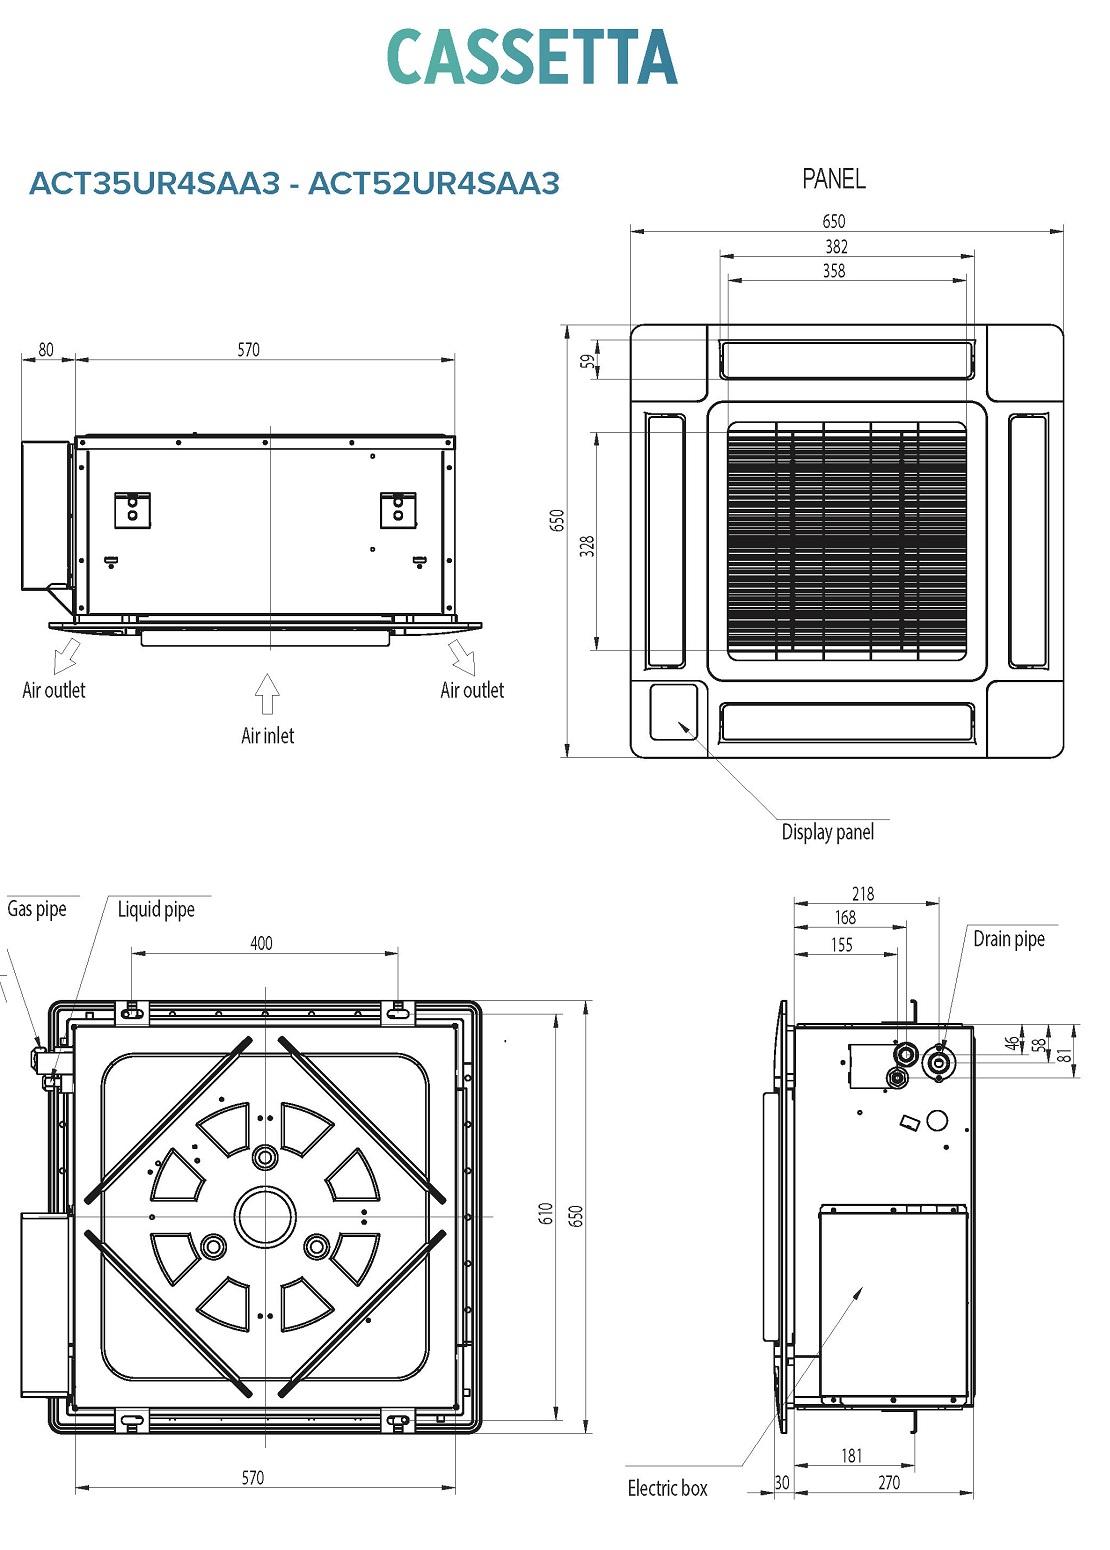 Condizionatore Hisense Commerciale 12000 Btu ACT35UR4SAA3 A++/A+